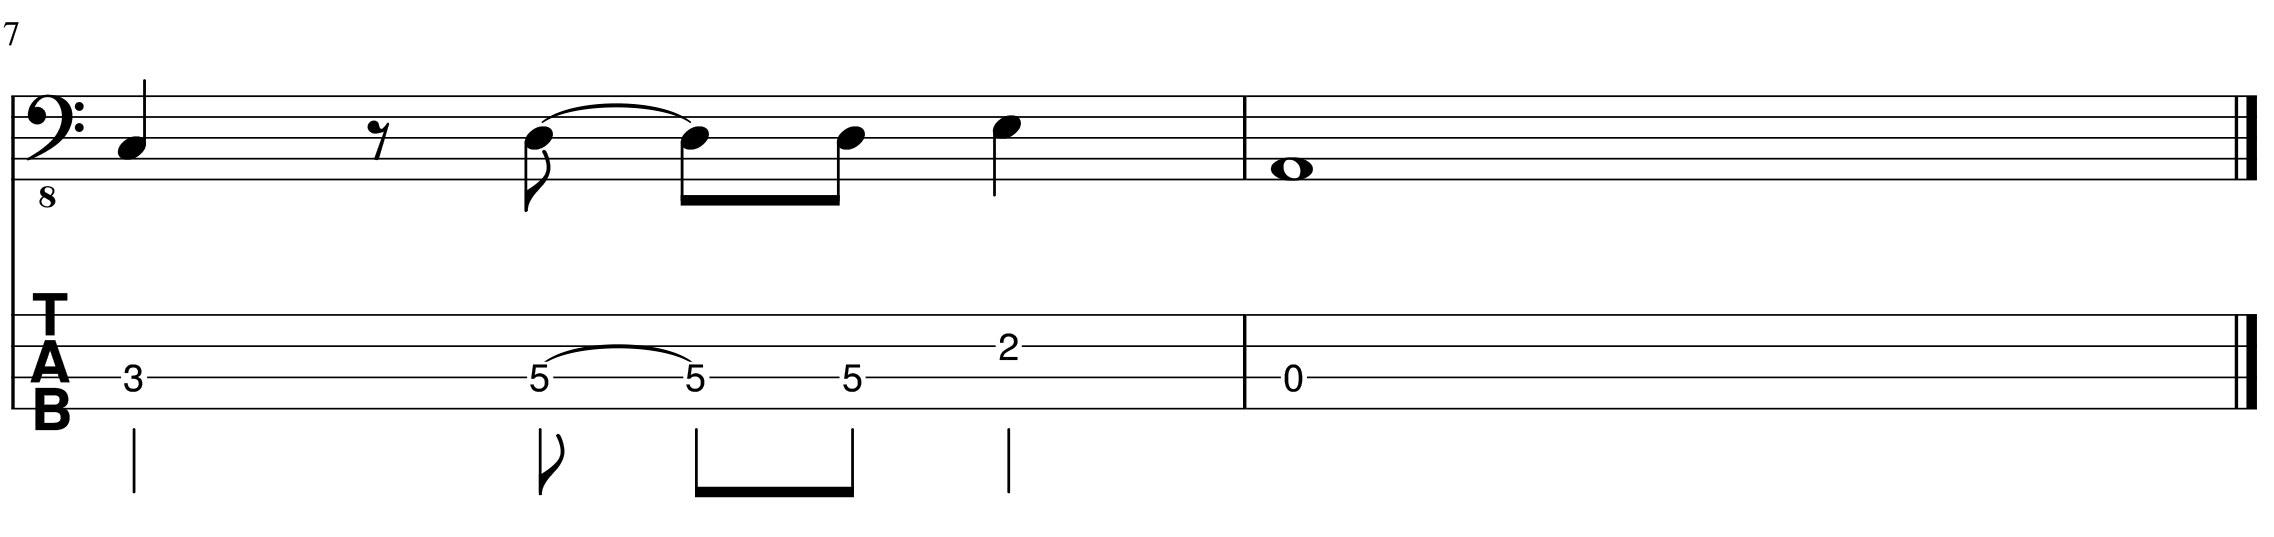 Bass-lernen-für-Anfänger-Bassline-2_4